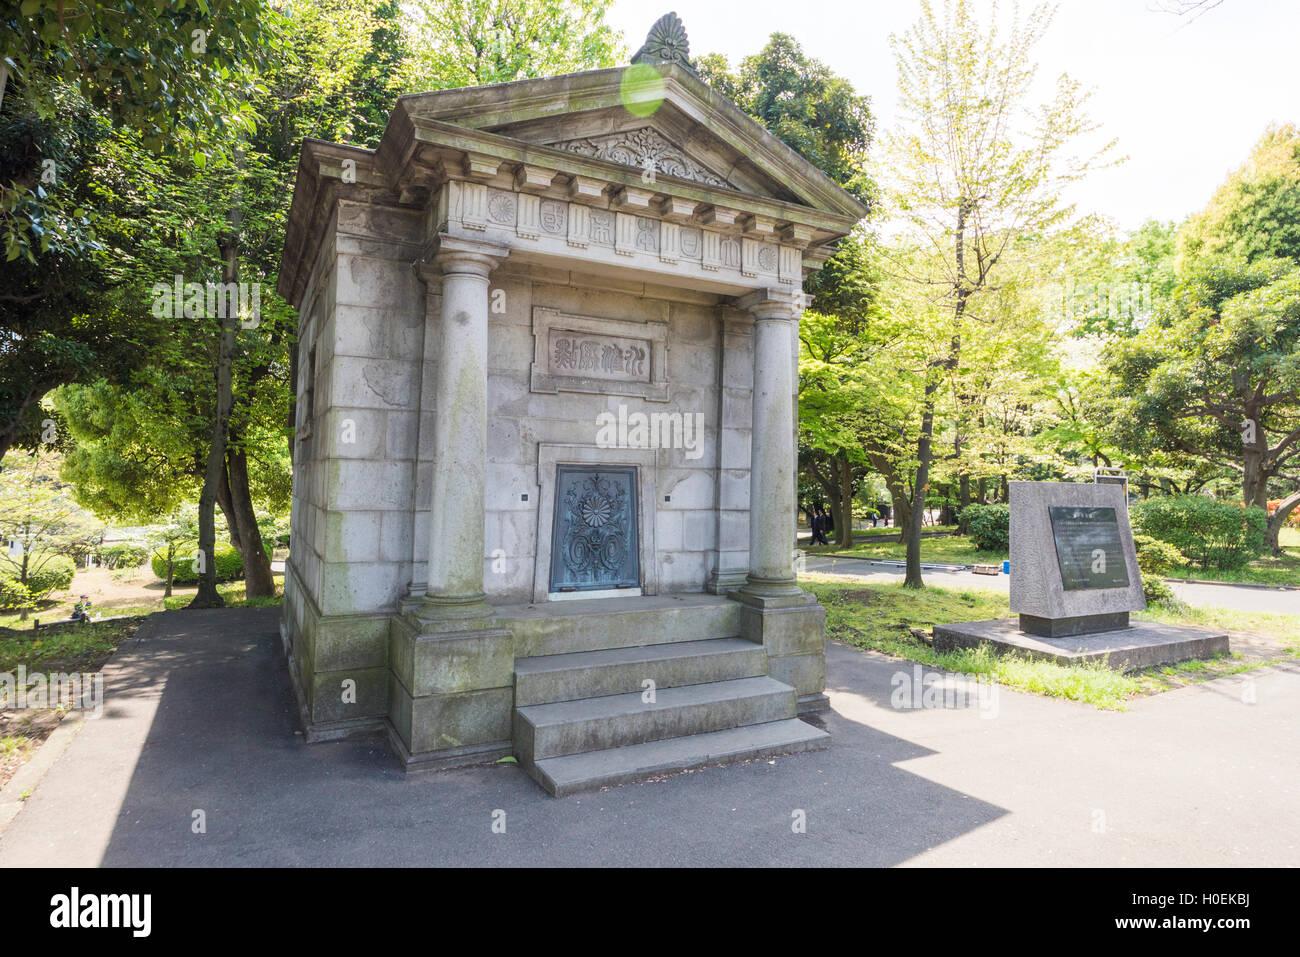 Japan vertical datum, Kasumigaseki, Chiyoda-Ku,Tokyo, Japan - Stock Image